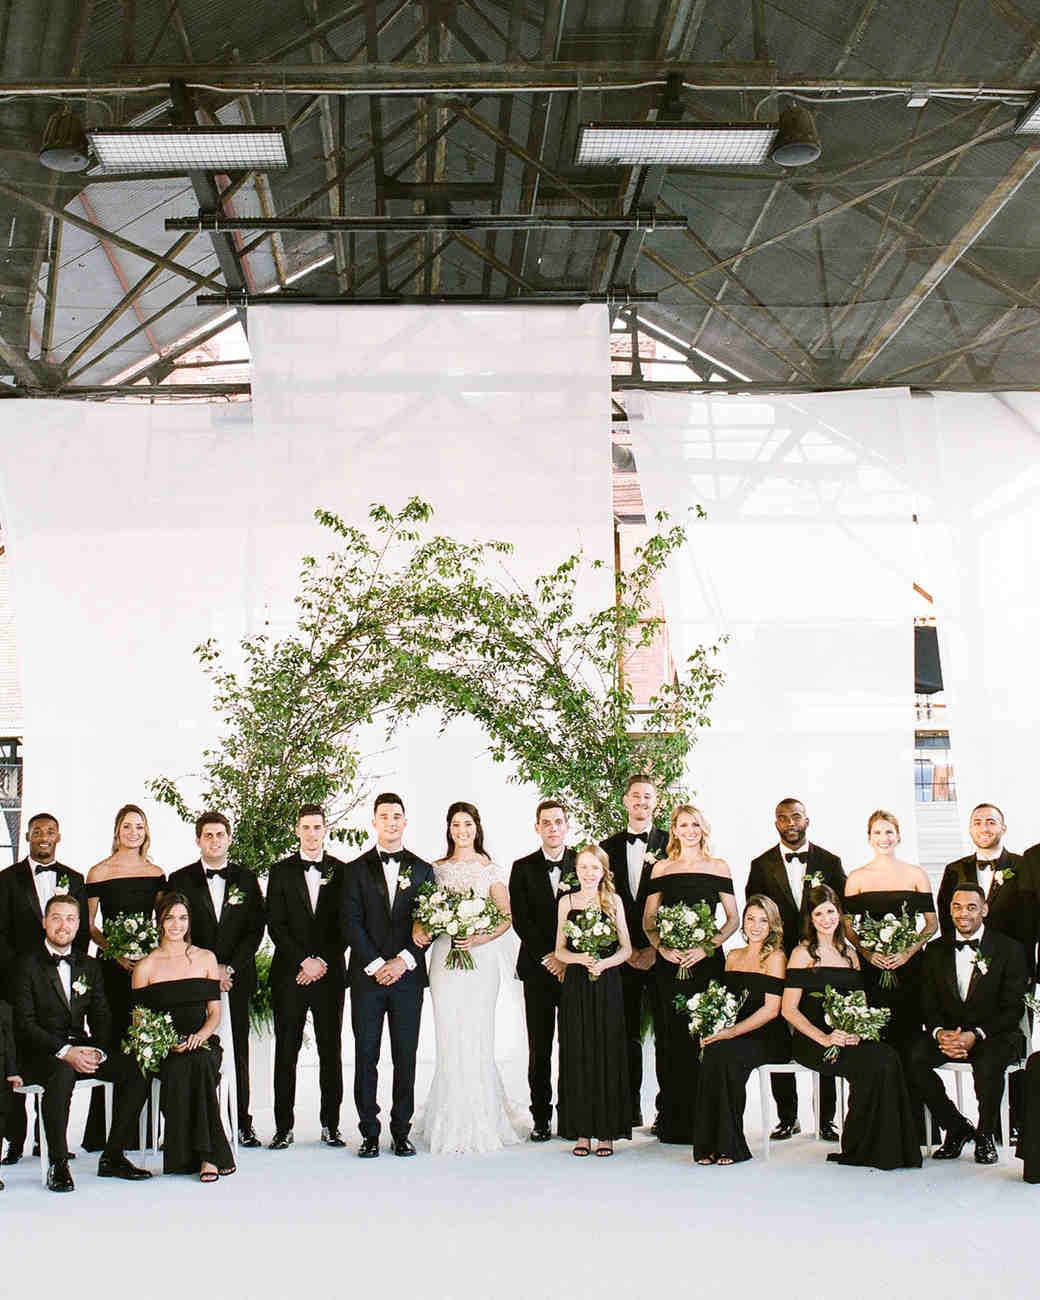 wedding party group shot white back drop